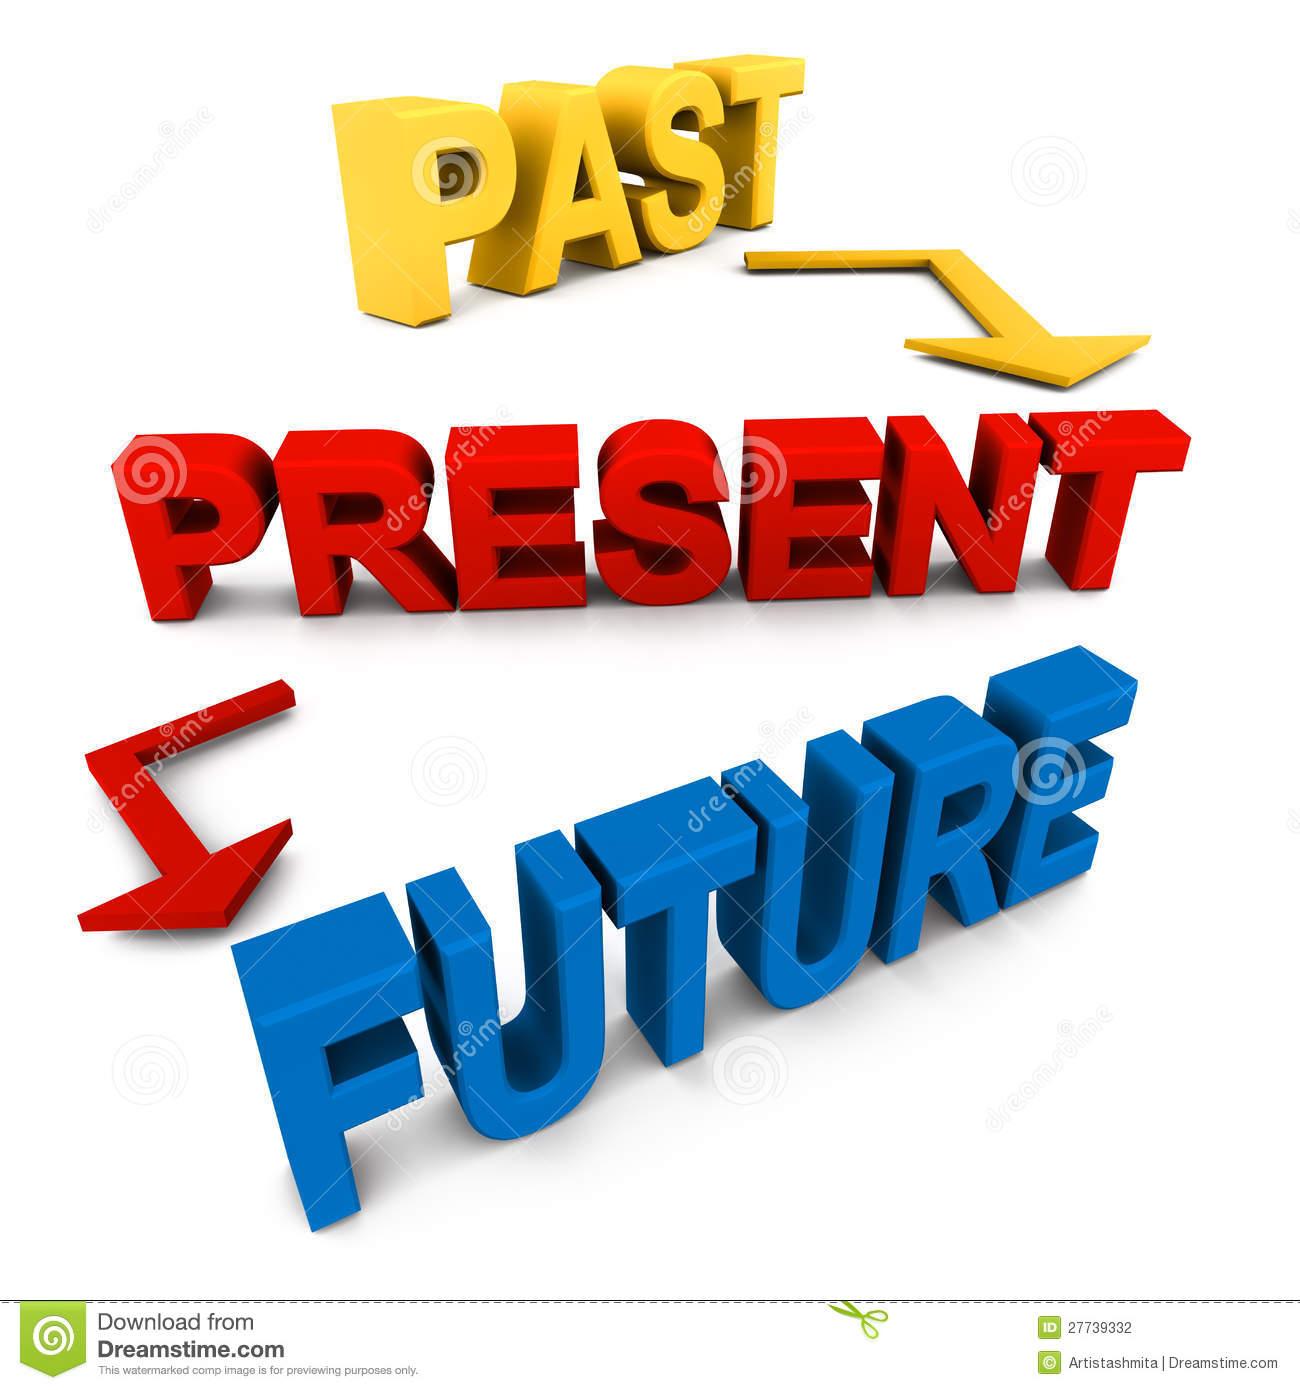 Past Present Future Clipart.